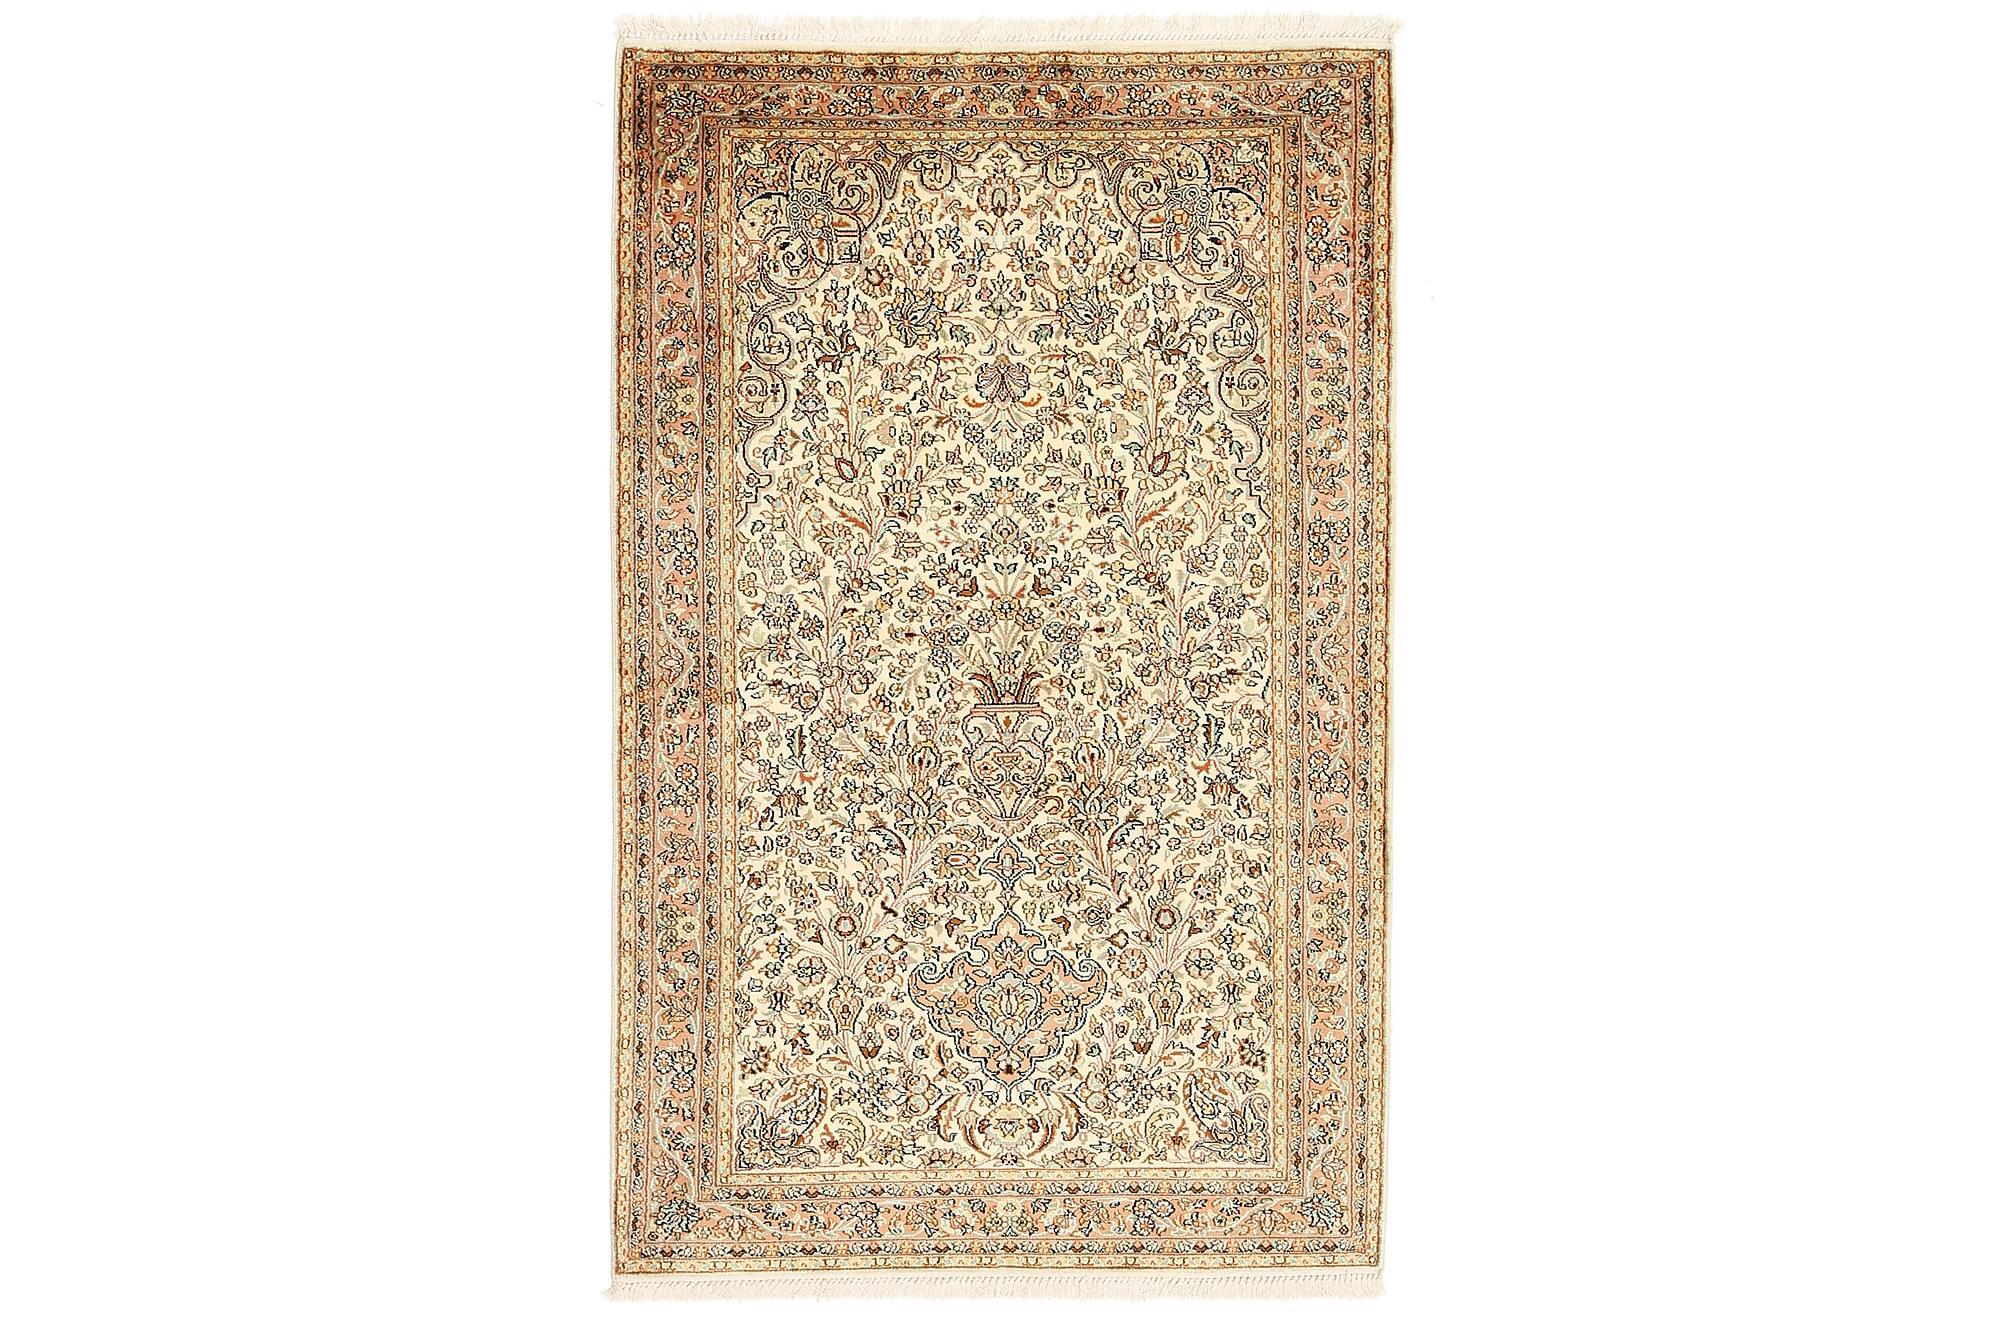 ORIENTALISK Silkesmatta Kashmir 97x159, Äkta silkesmattor